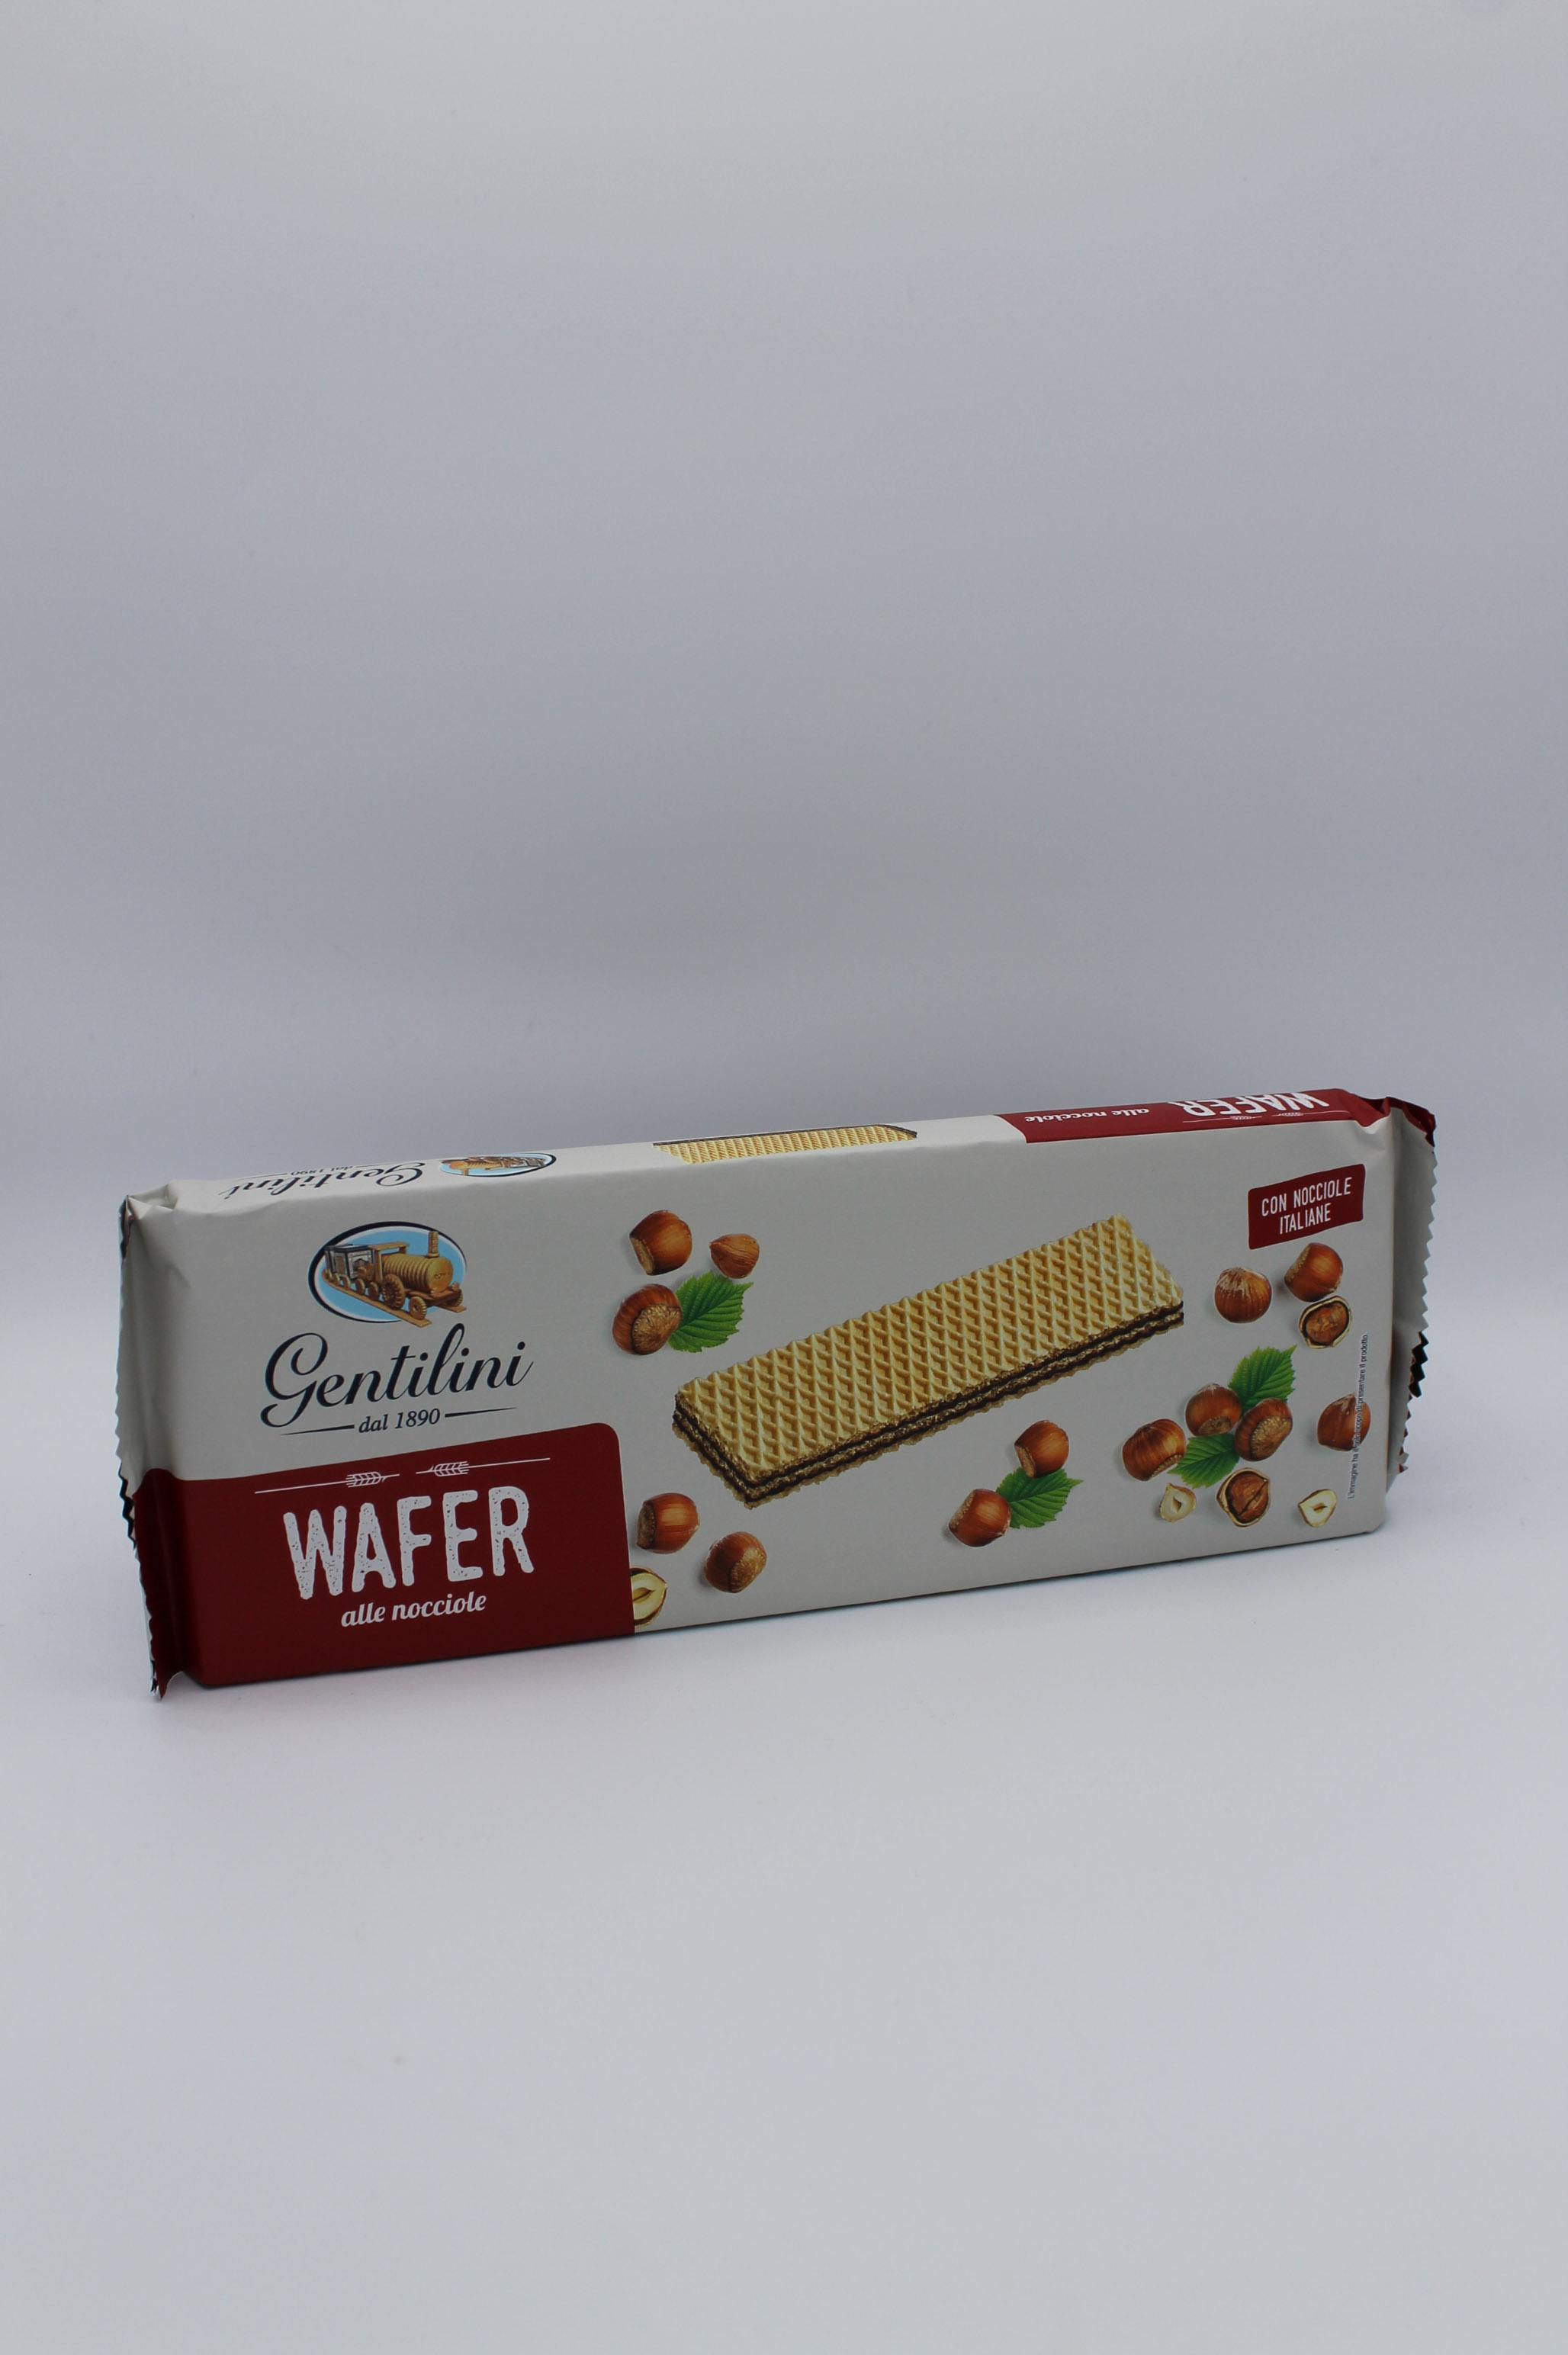 Gentilini wafer 175 gr vari gusti.